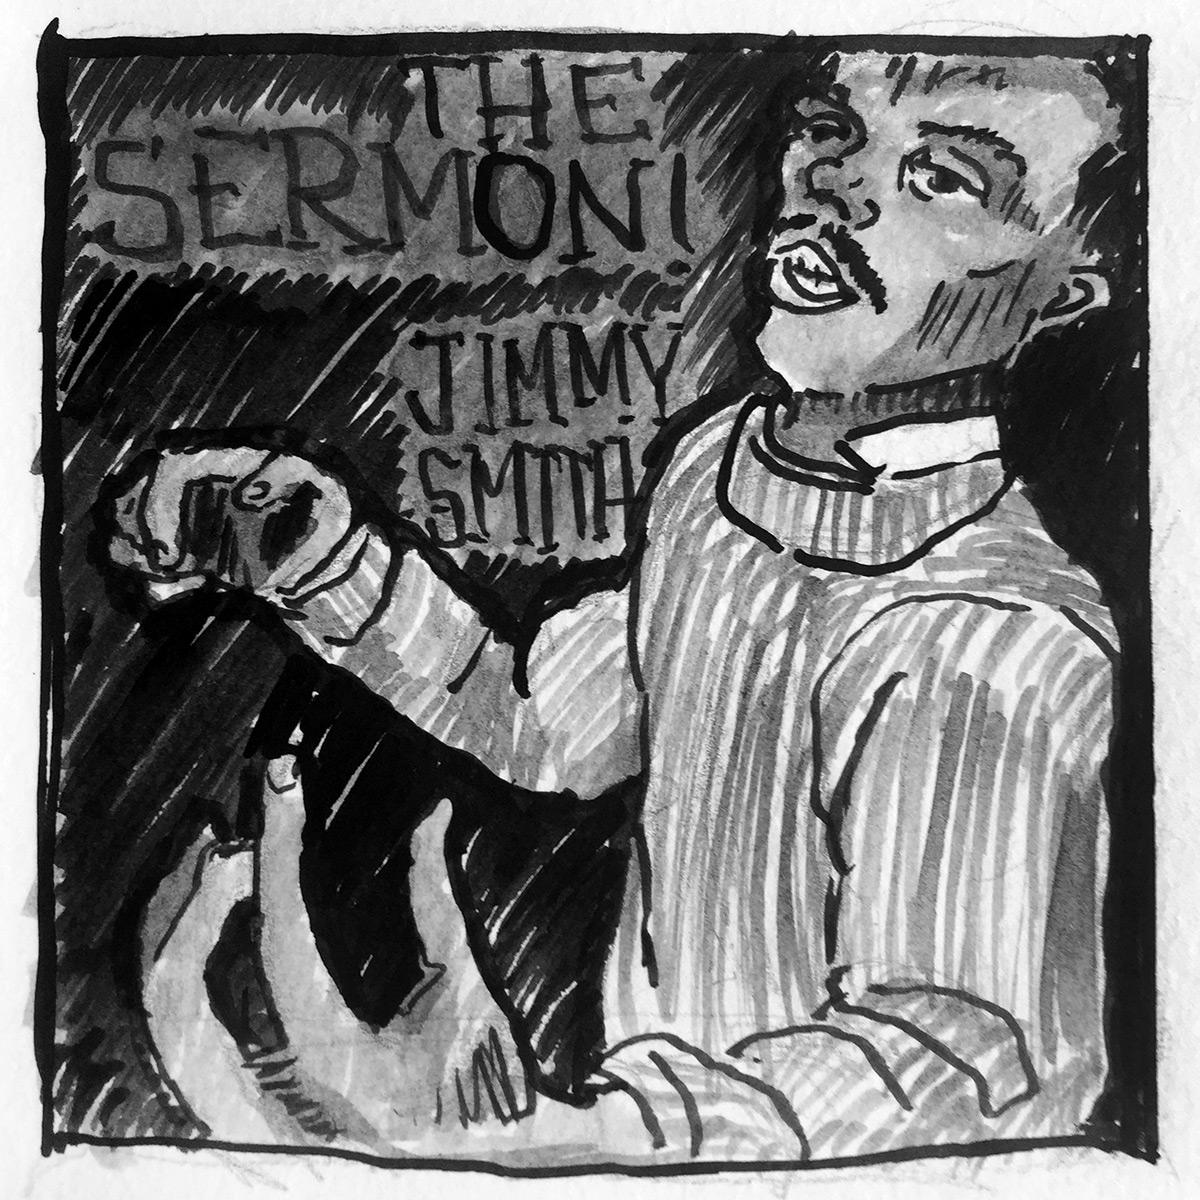 Jimmy Smith The Sermon